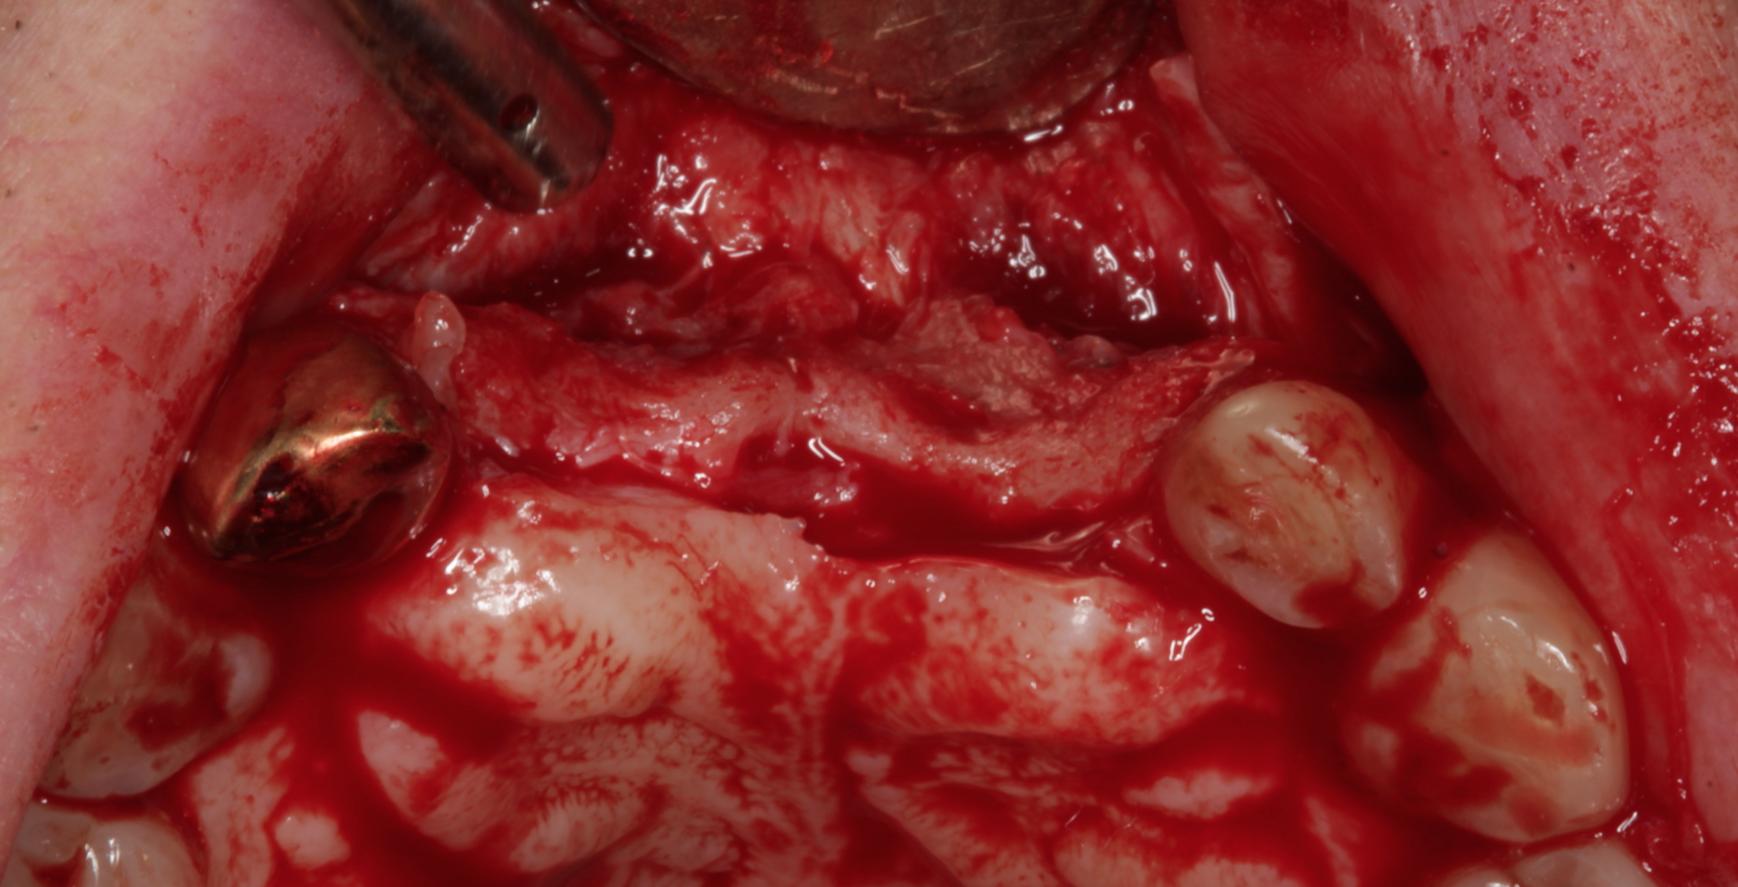 Severe Bone Deficiency